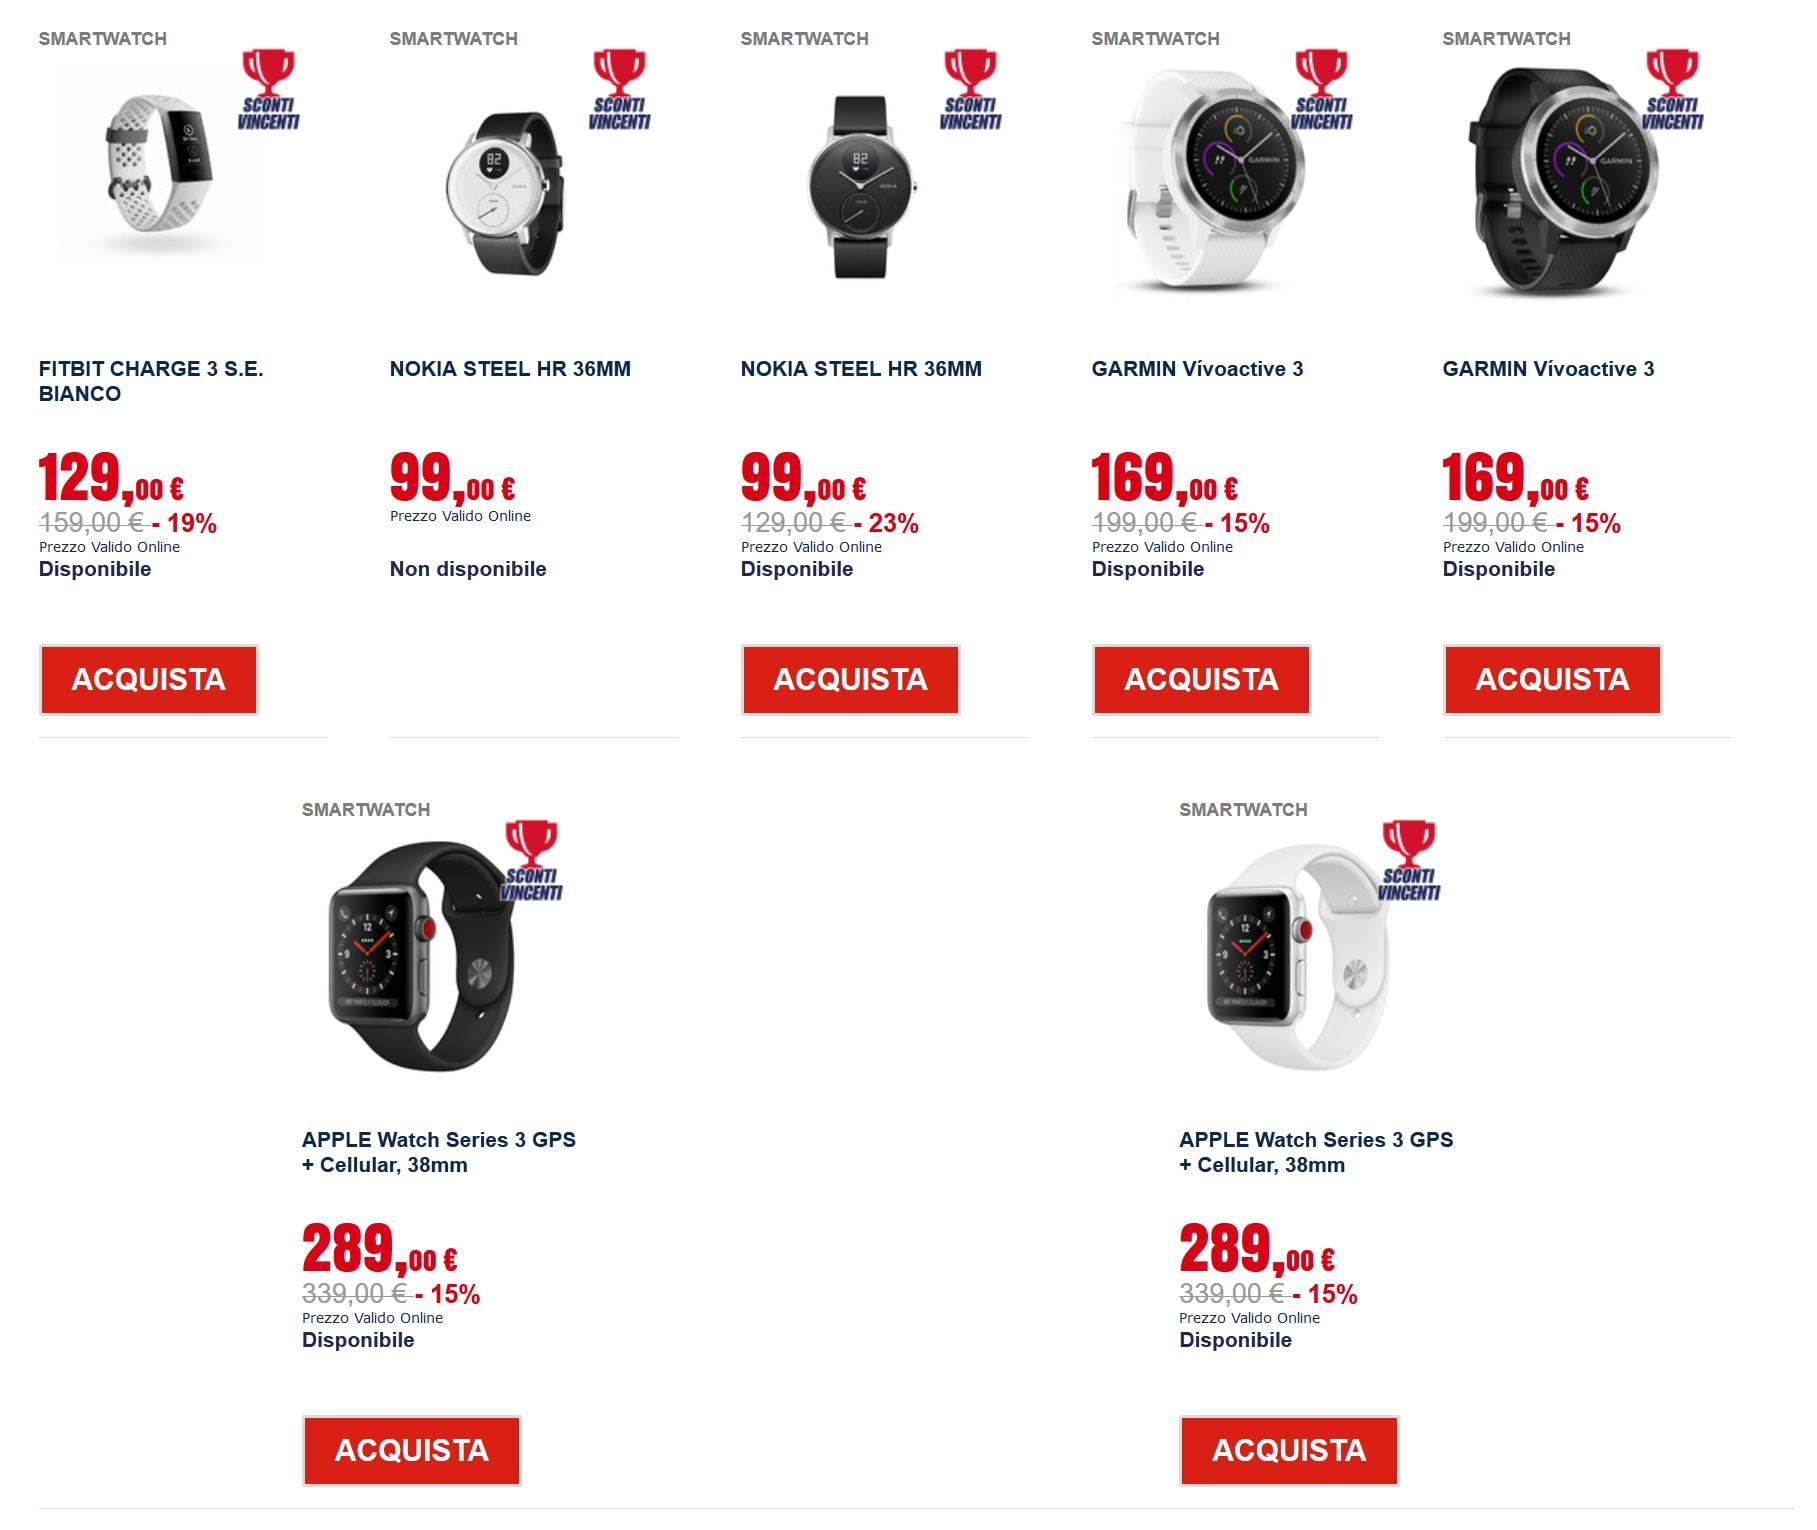 trony sconti vincenti – smartwatch